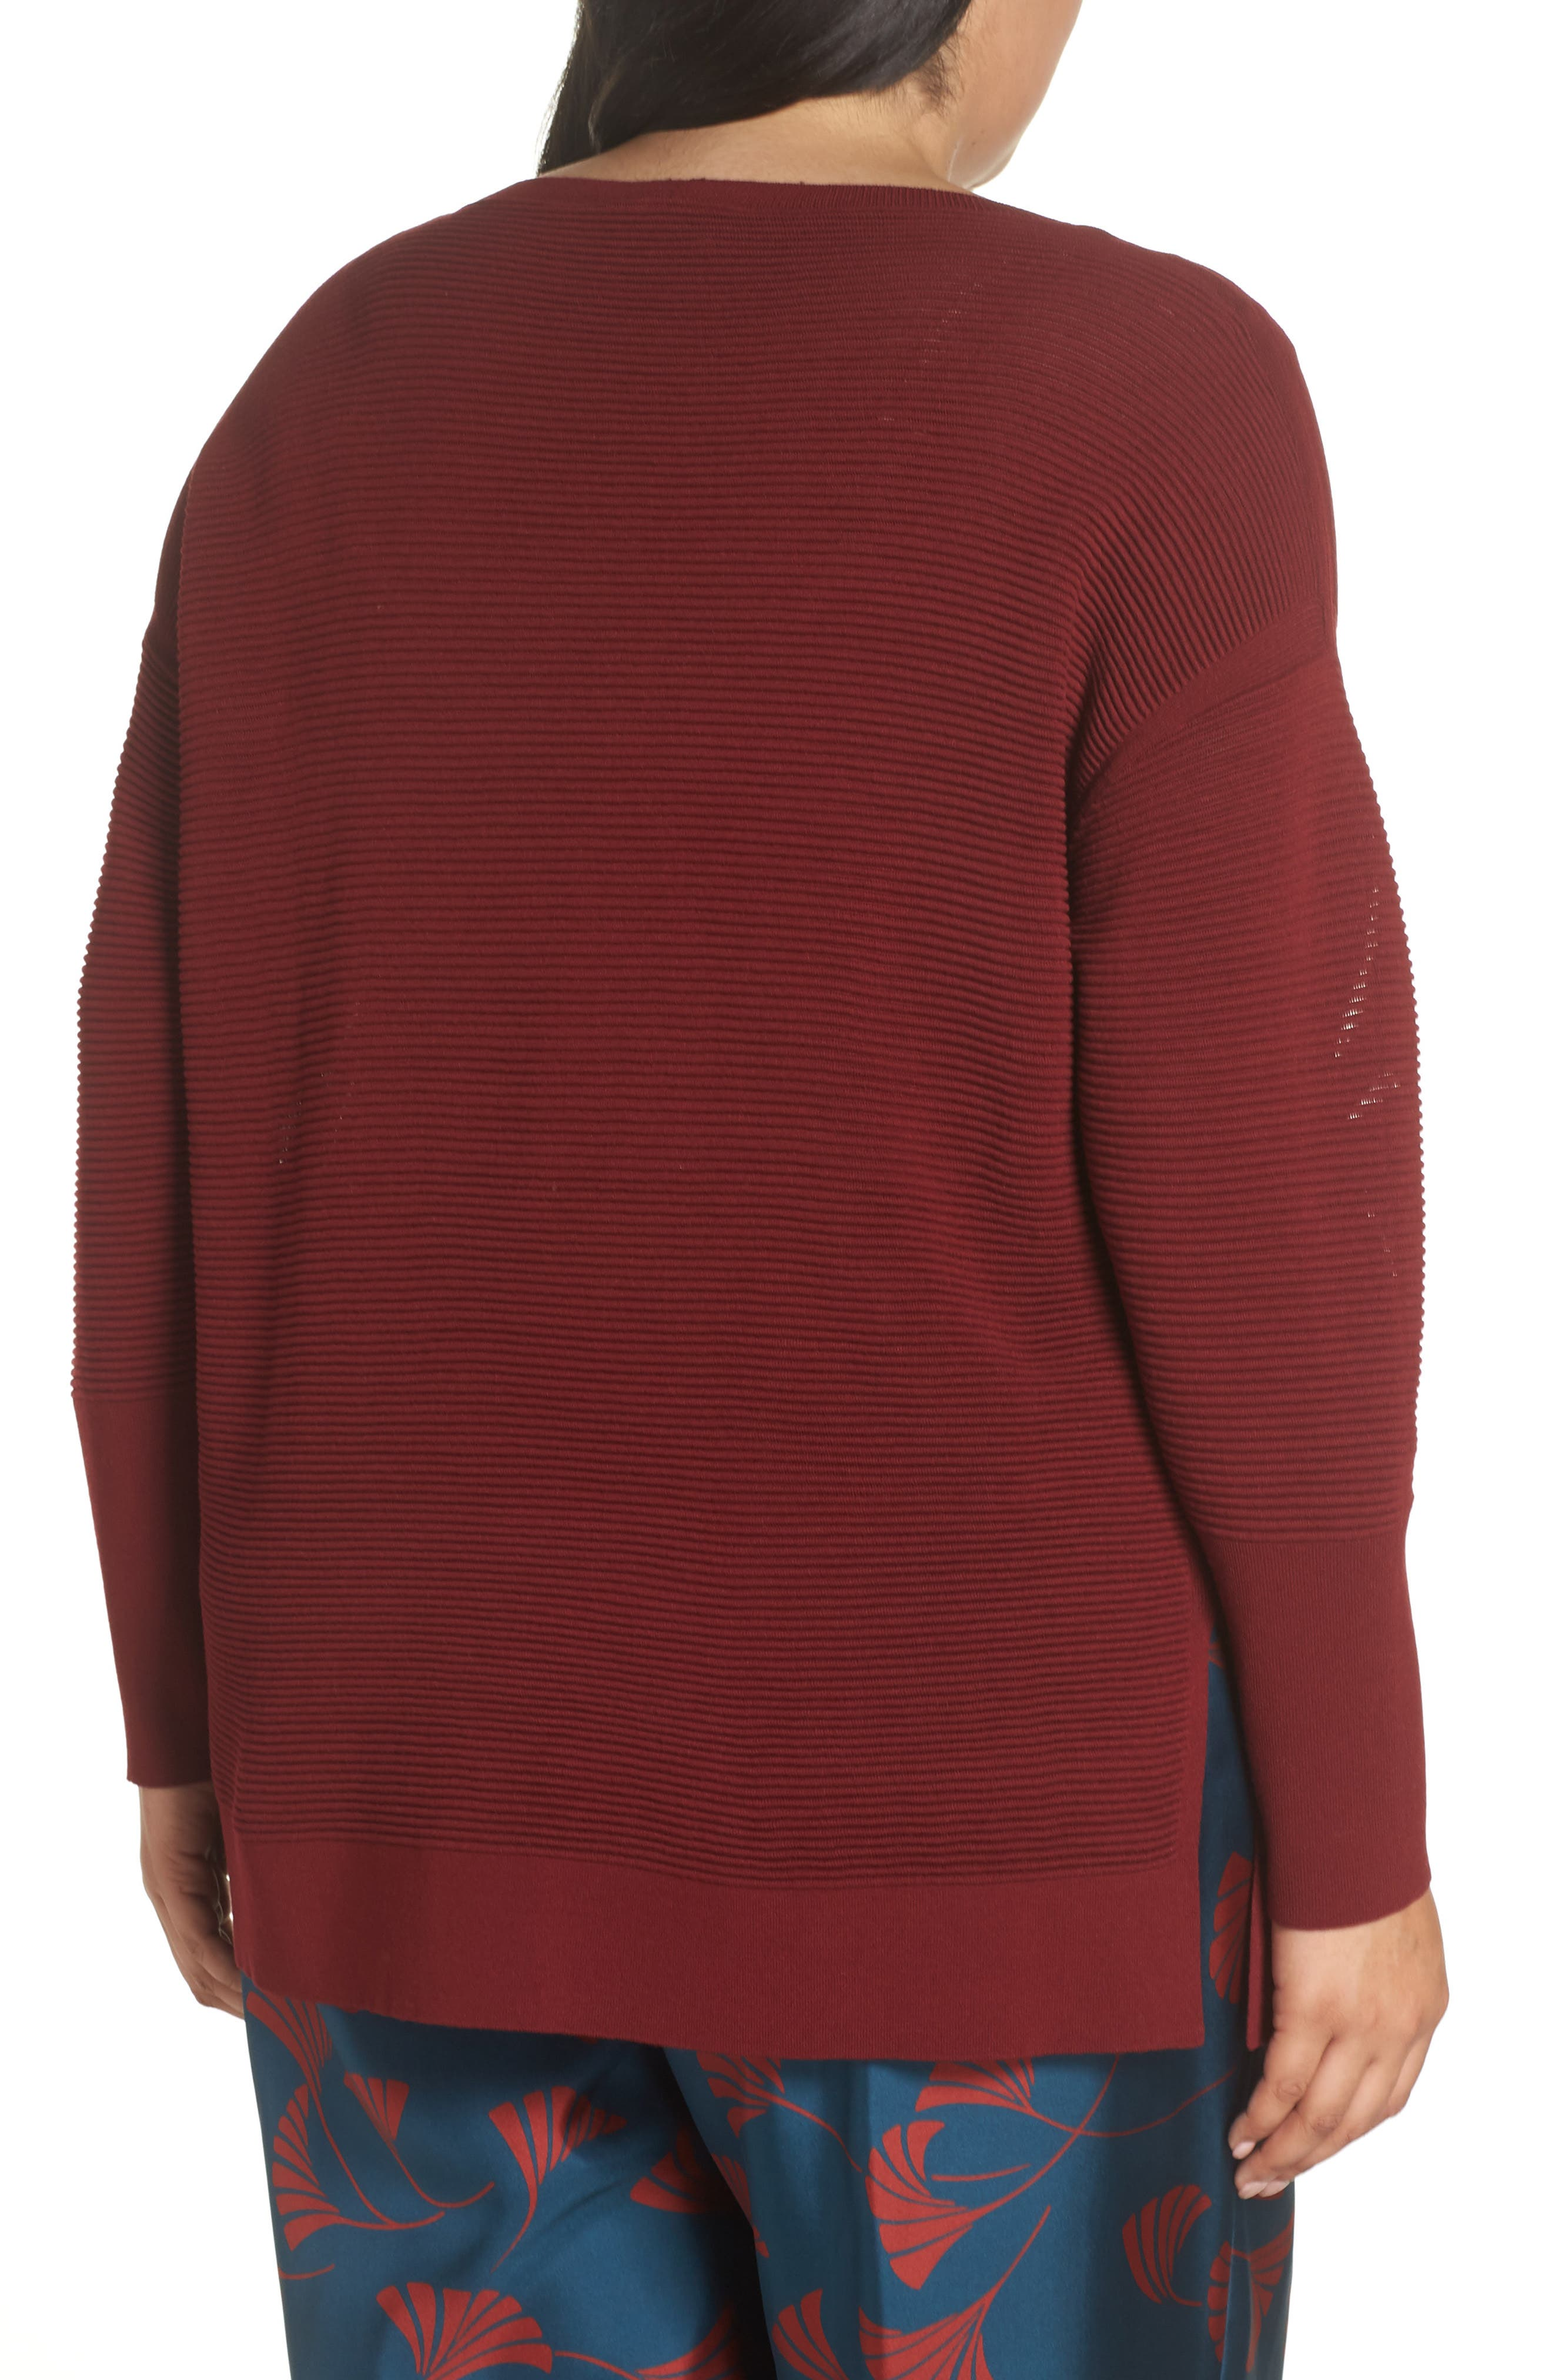 LAFAYETTE 148 NEW YORK,                             Bateau Neck Matte Crepe Sweater,                             Alternate thumbnail 2, color,                             601